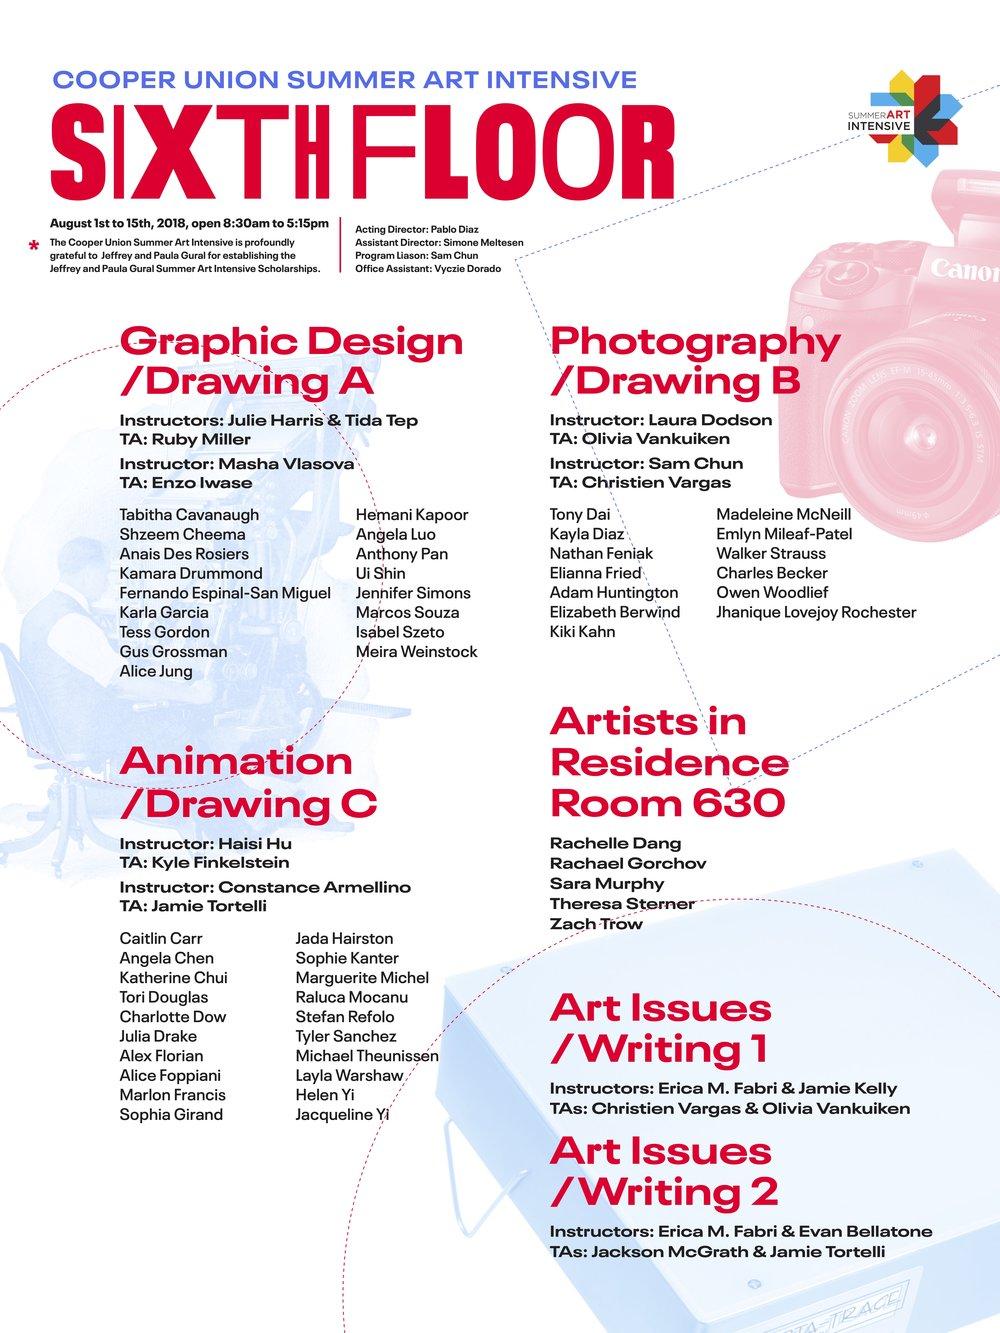 Exhibition Signage––725183.jpg